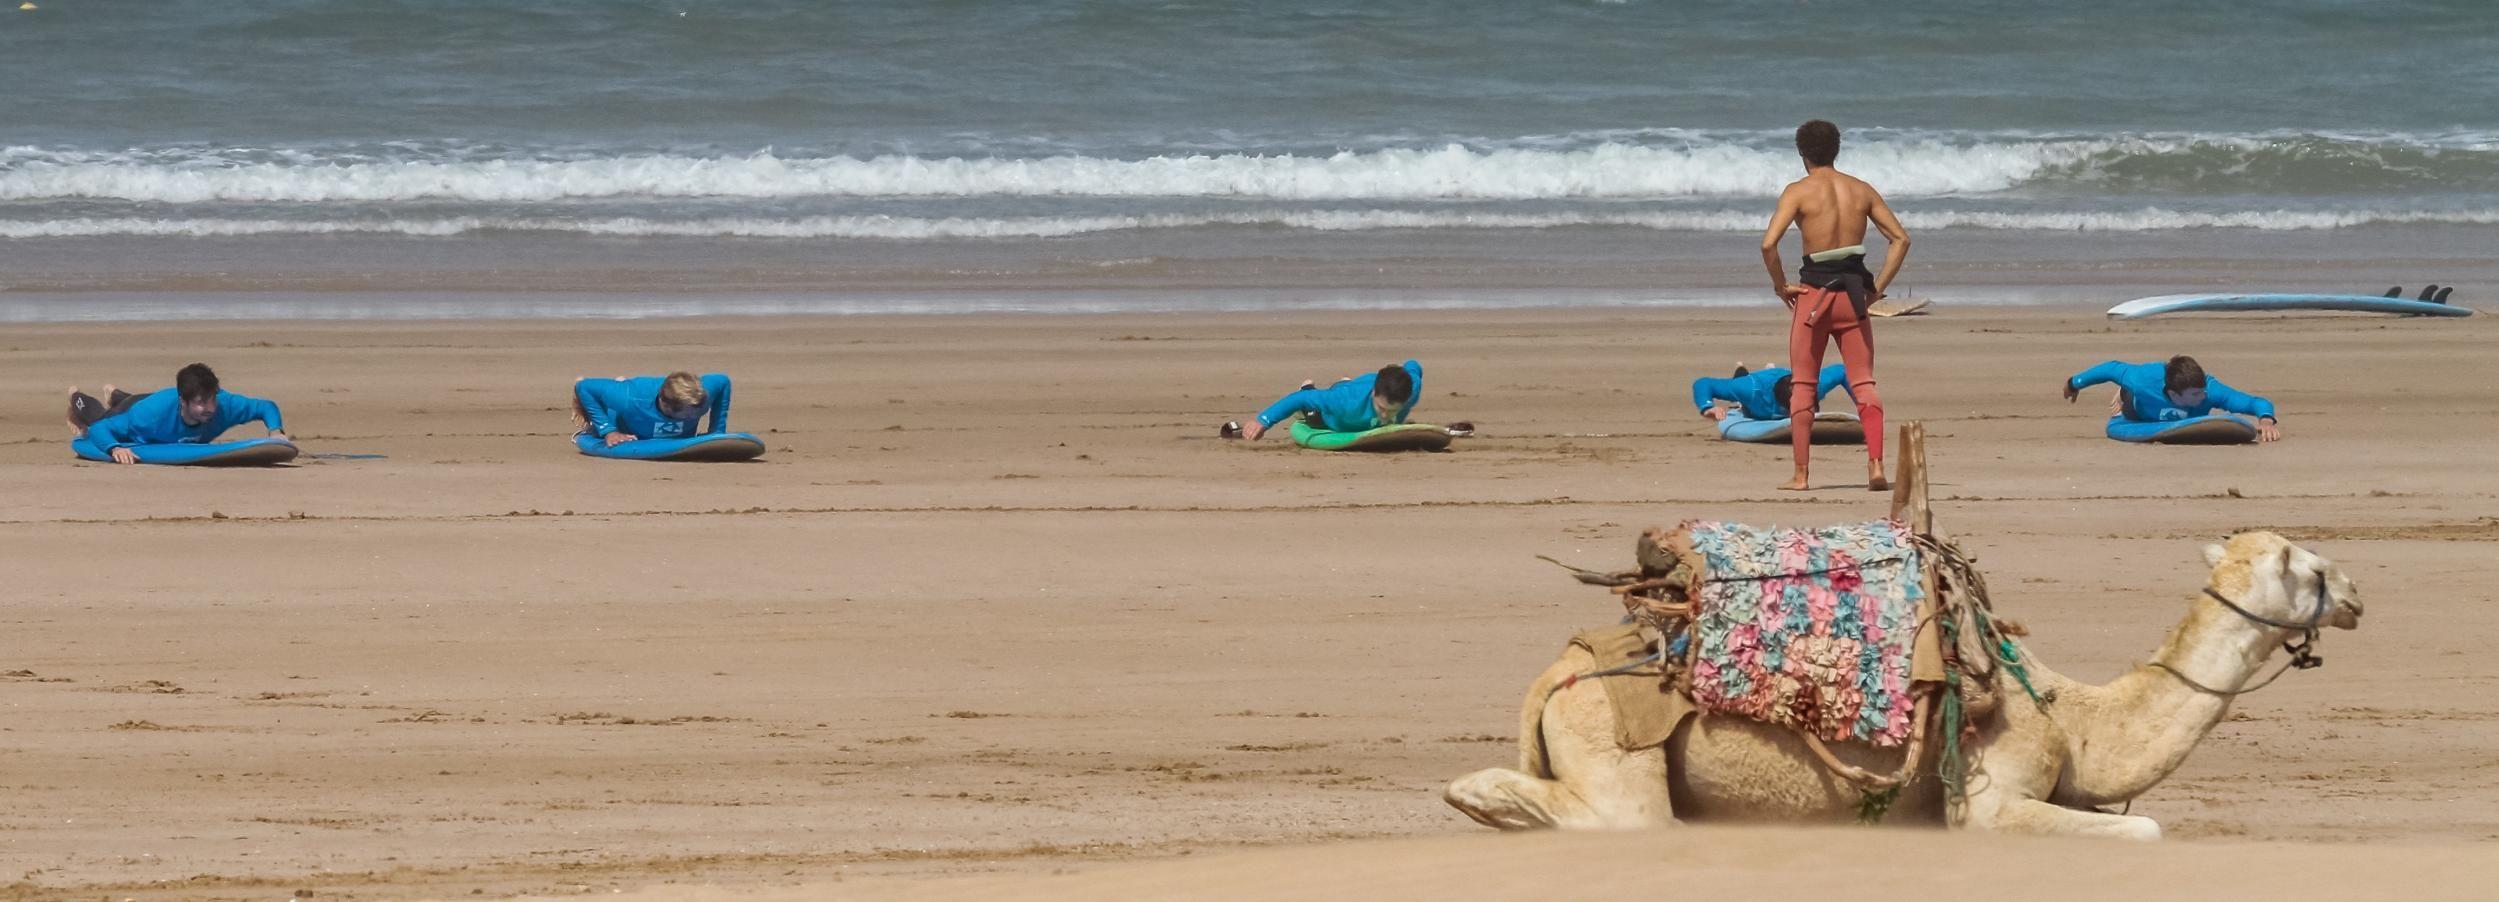 From Marrakesh: Essaouira Surfing Day Trip